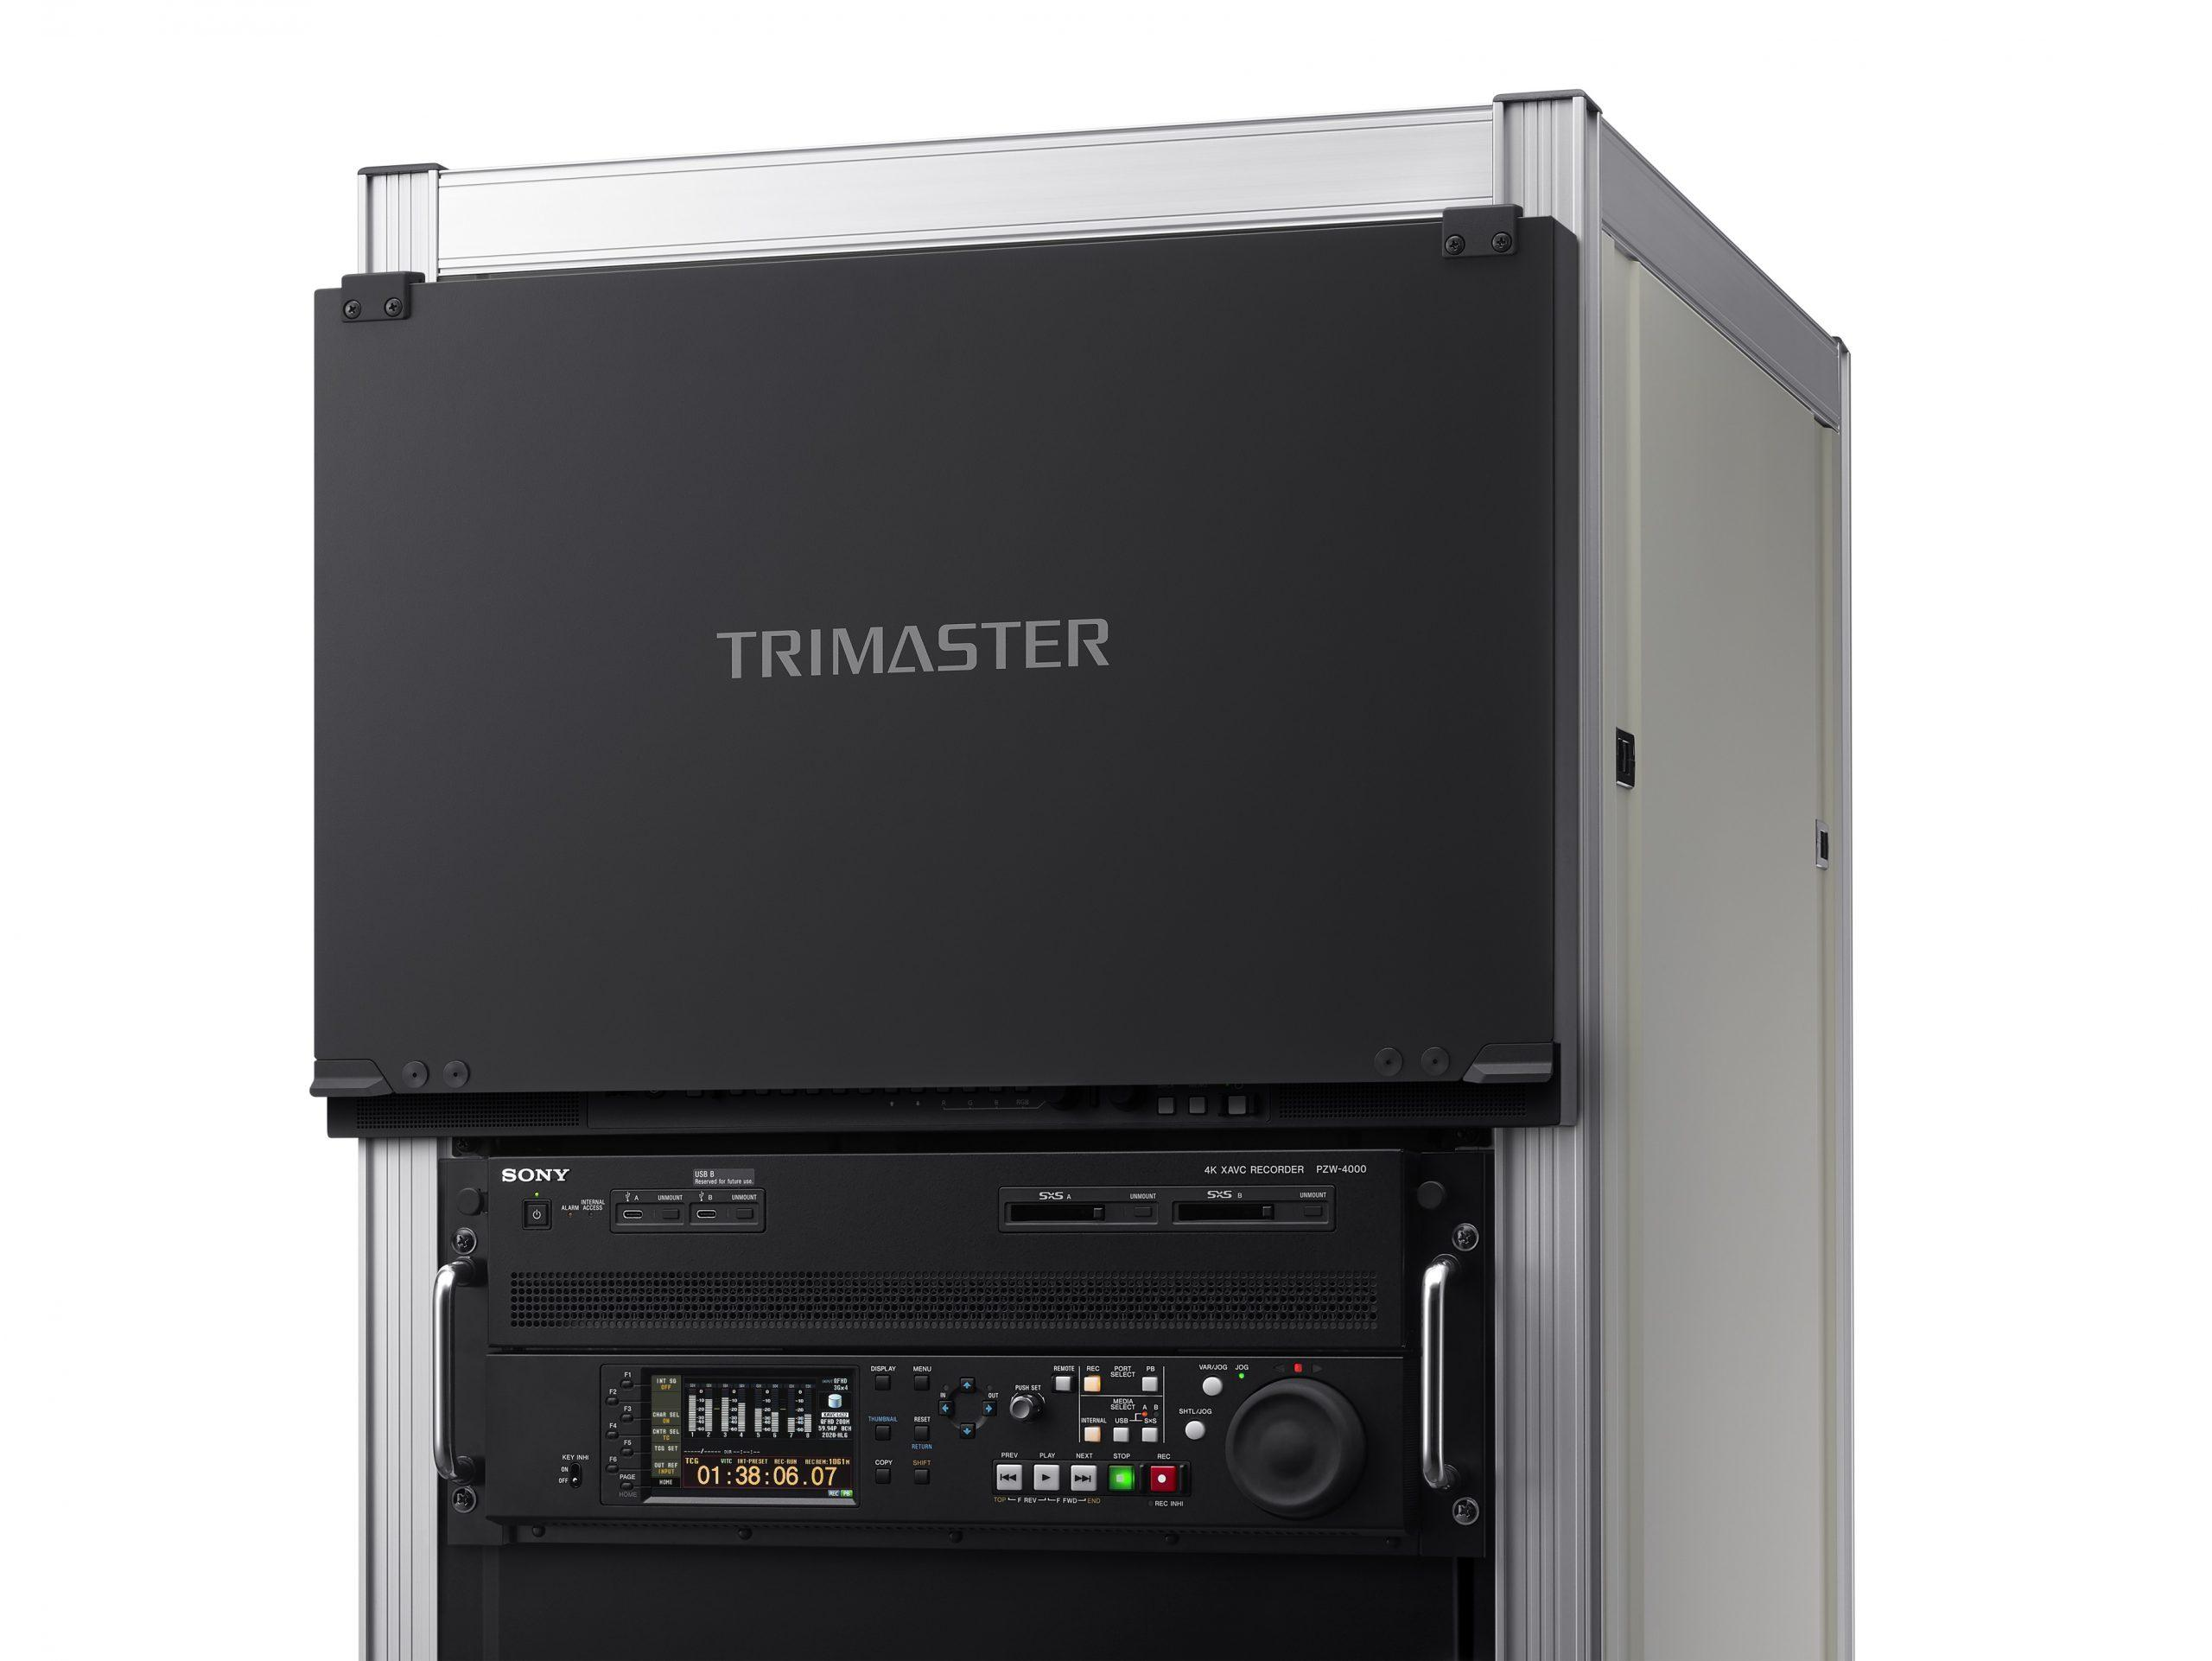 Sony Trimaster PMV X2400 4K HD Tapado_rack